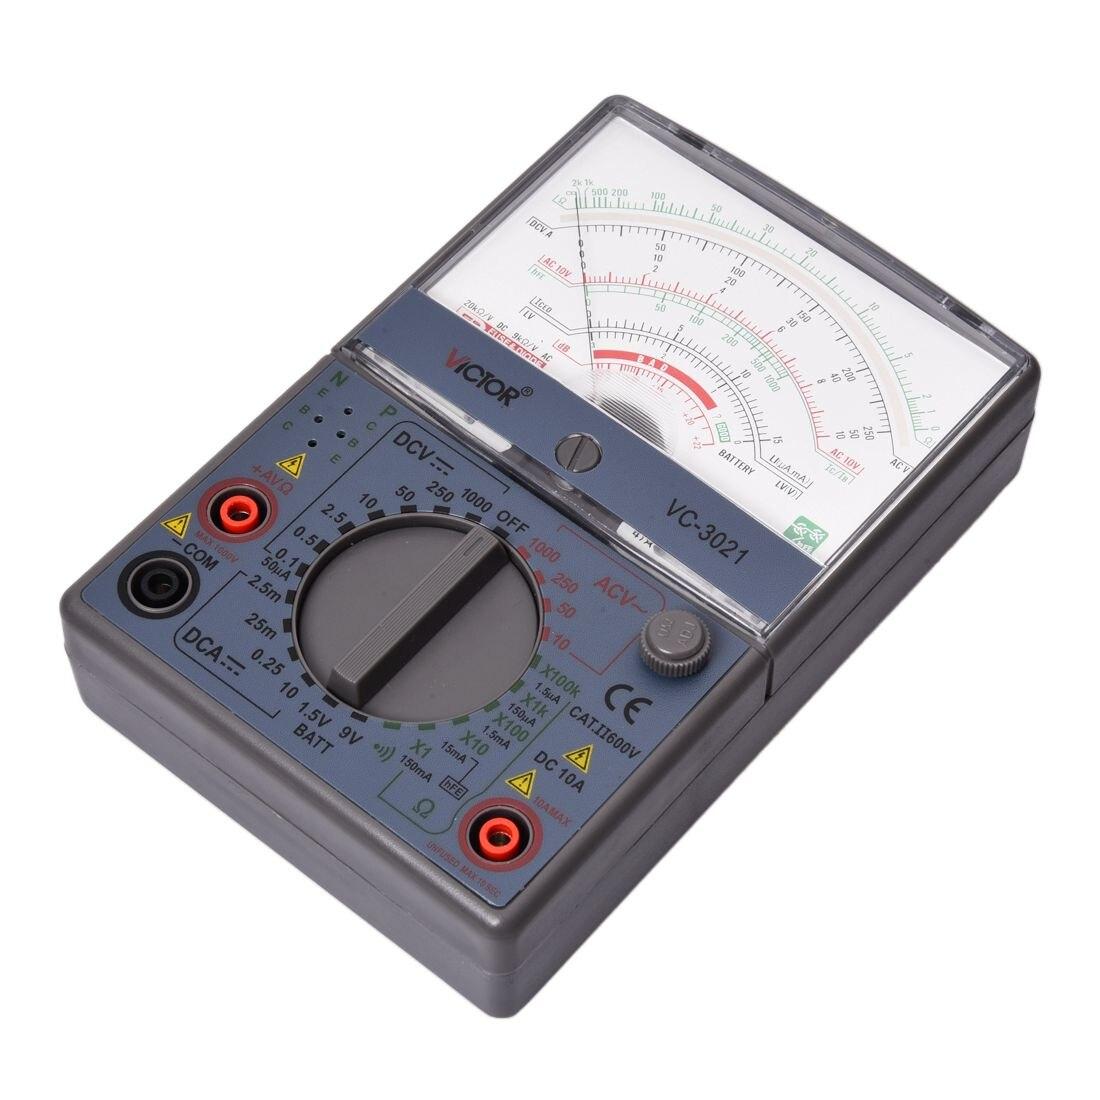 VICTOR VC3021 Analog Multimeters, Mechanical Multimeter, The New, Measurable 4 8 days arrival hioki 3030 10 analog multimeters